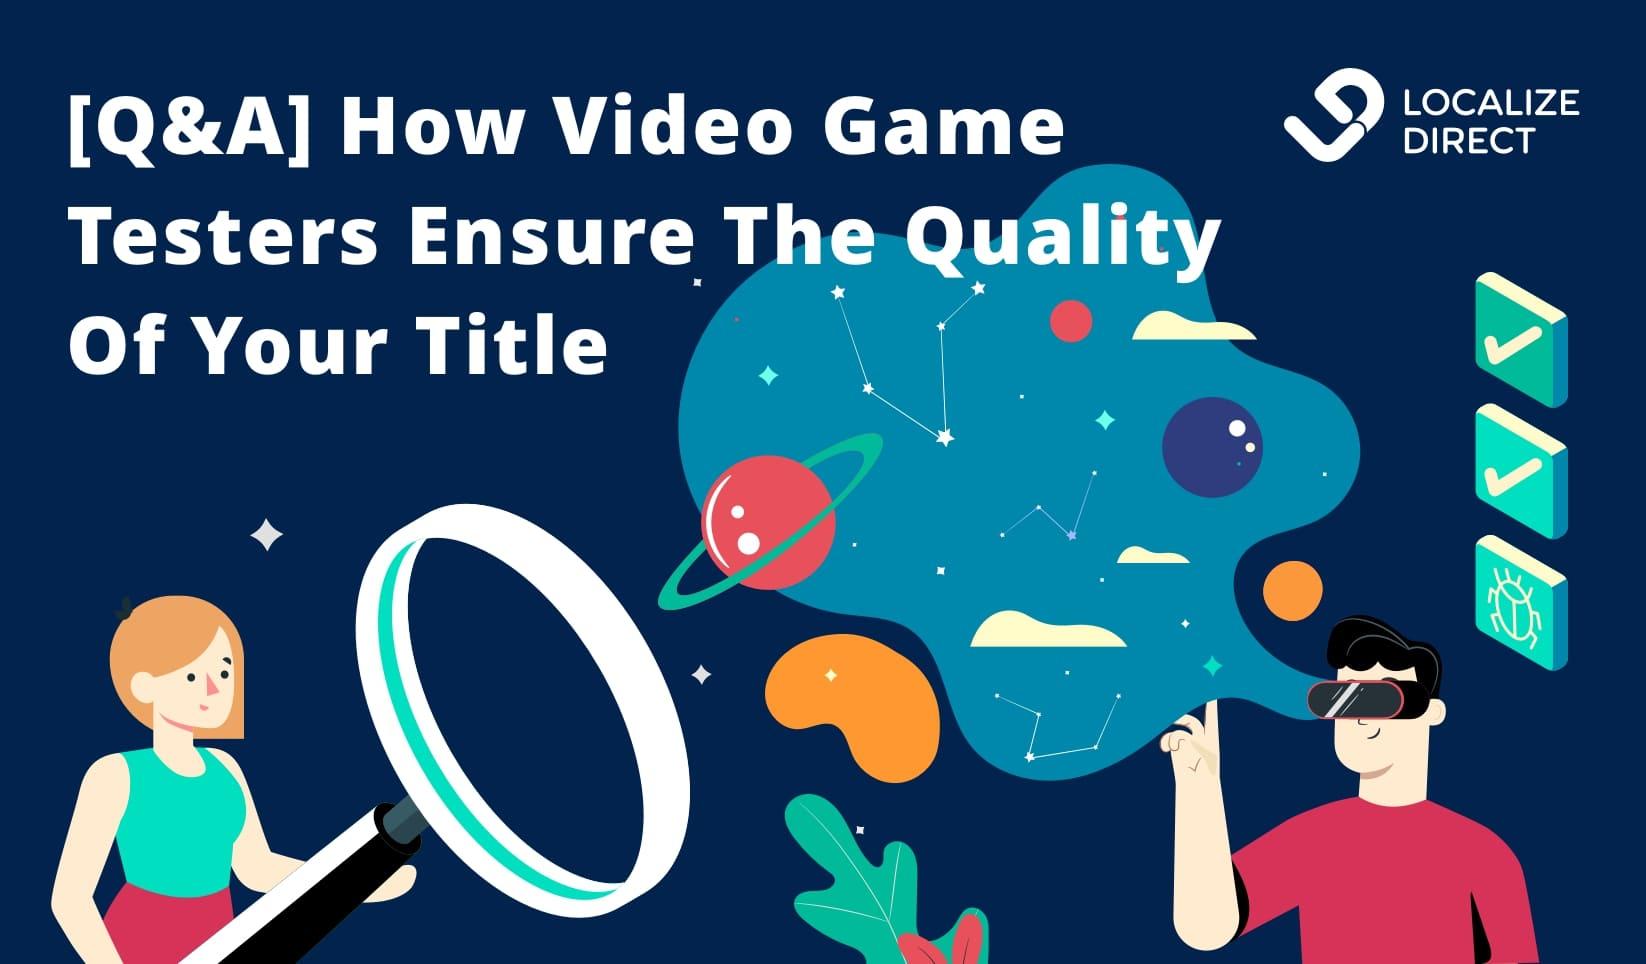 Localization QA: How Video Game Testers Work (Q&A)